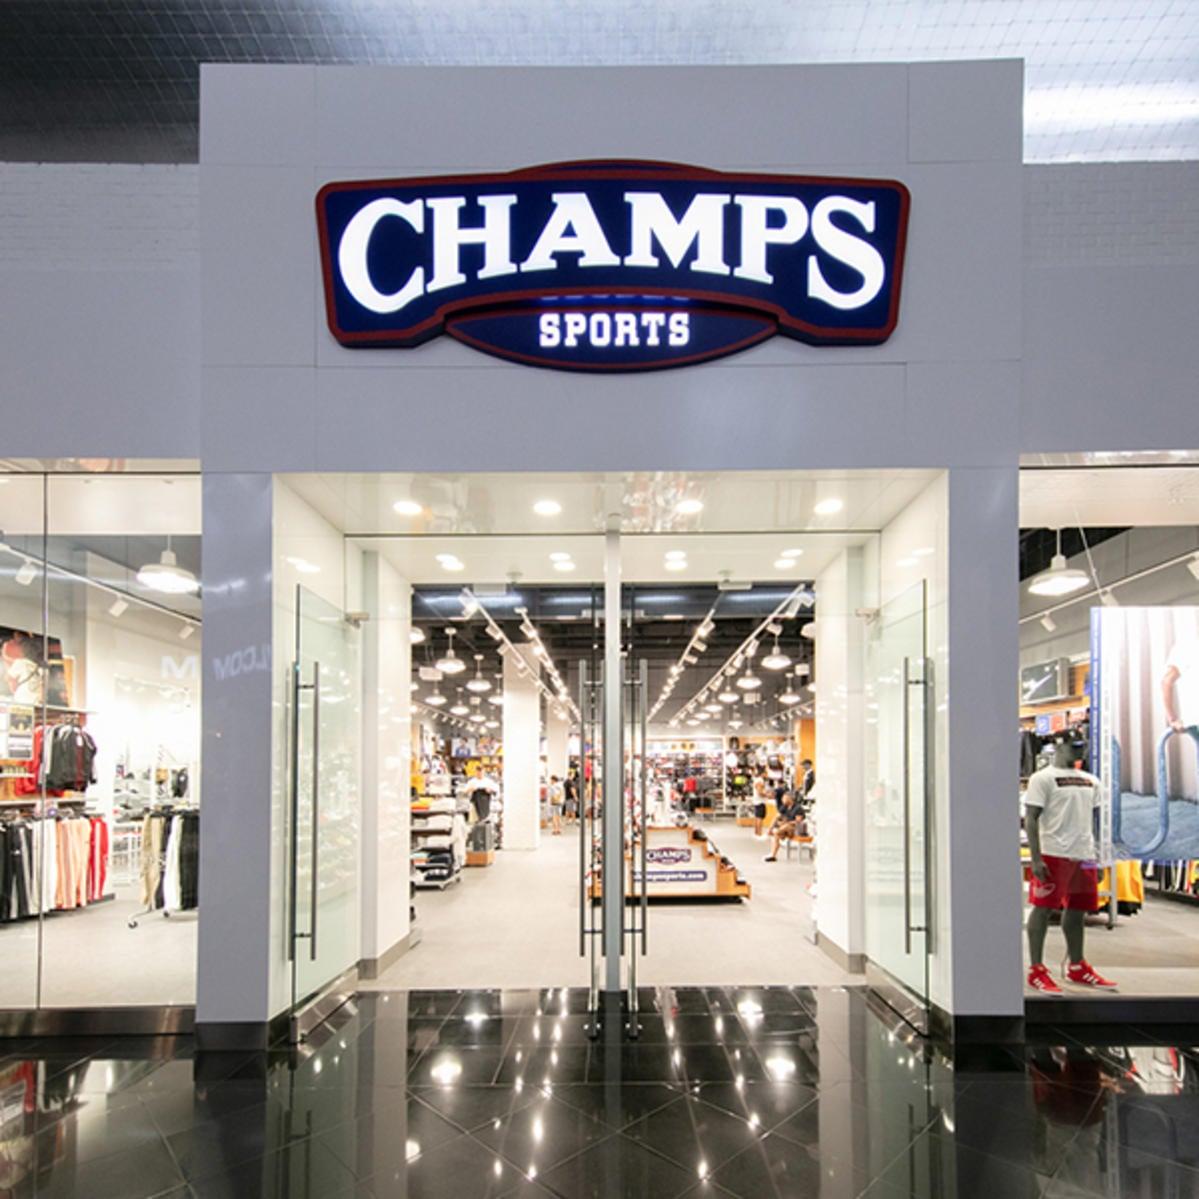 Champs Sports Miracle Mile Shops, Las Vegas  Miracle Mile Shops, Las Vegas